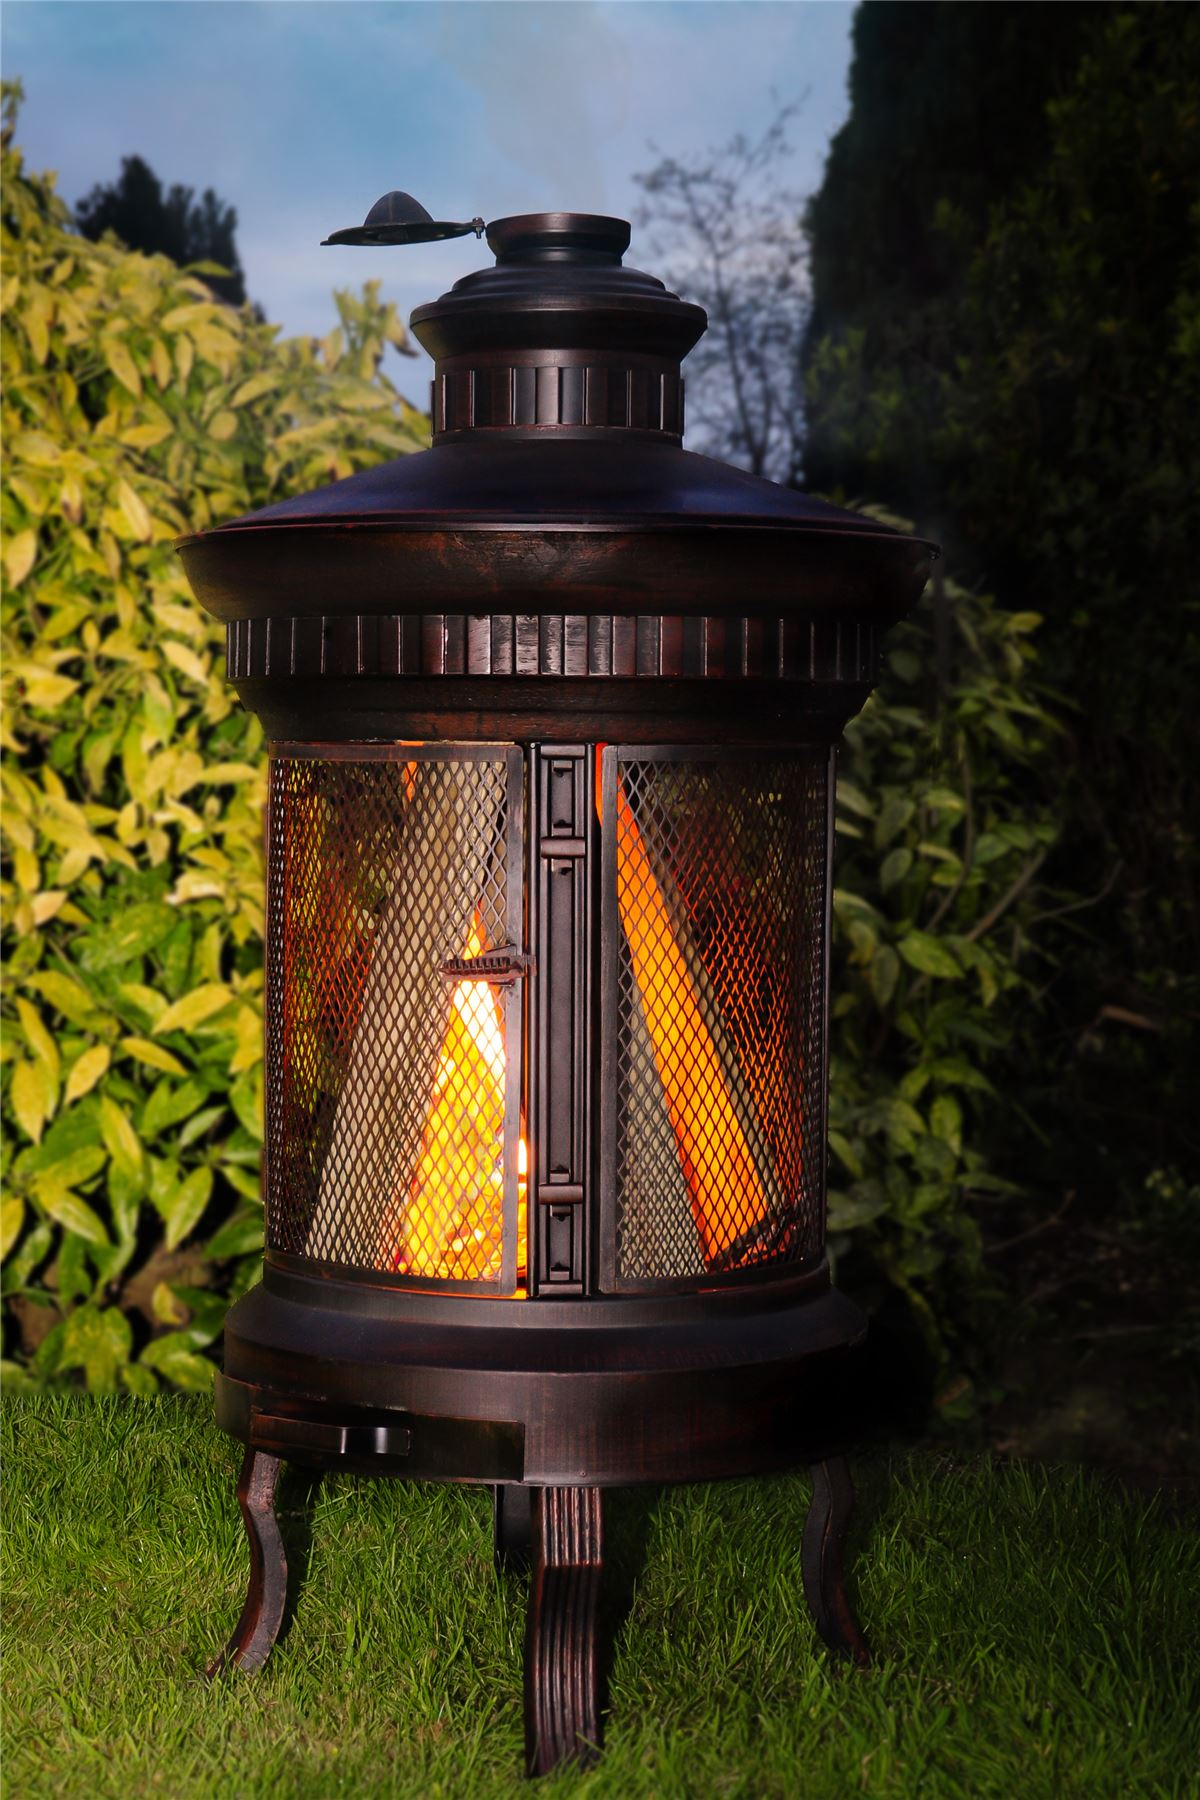 High Quality Image Is Loading Wrought Iron Garden Wood Burner Log Burner Chimenea